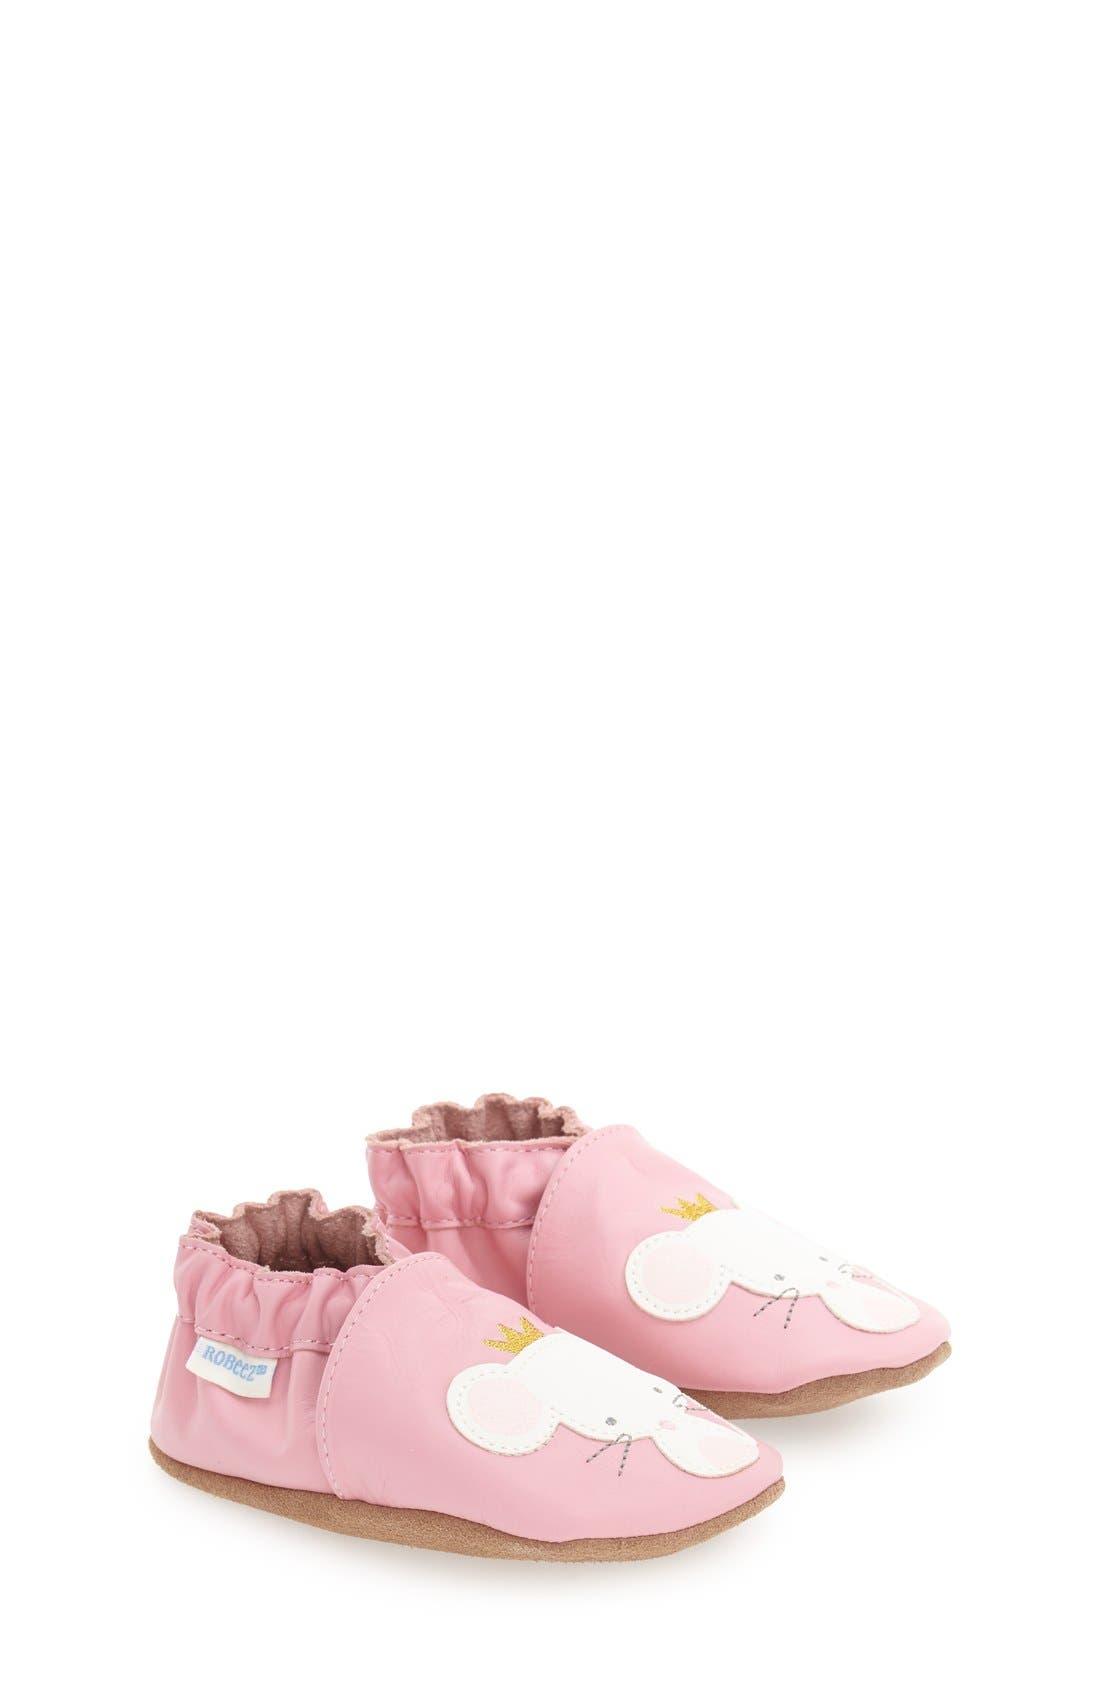 'Princess' Crib Shoe,                             Main thumbnail 1, color,                             Prism Pink Leather